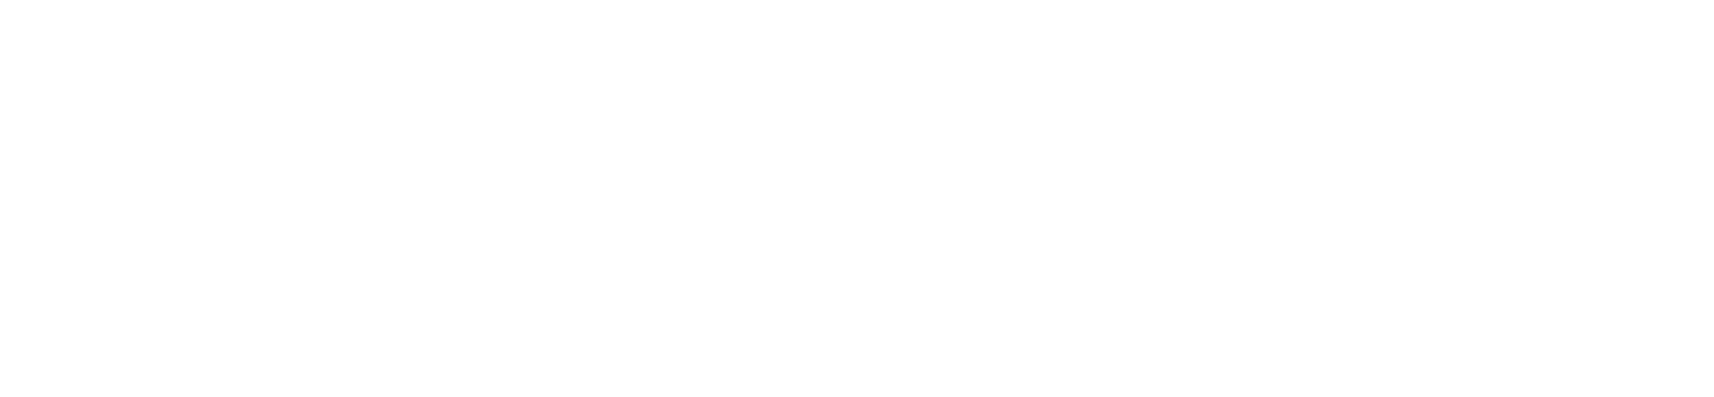 Keller Williams Energy Real Estate, Brokerage logo